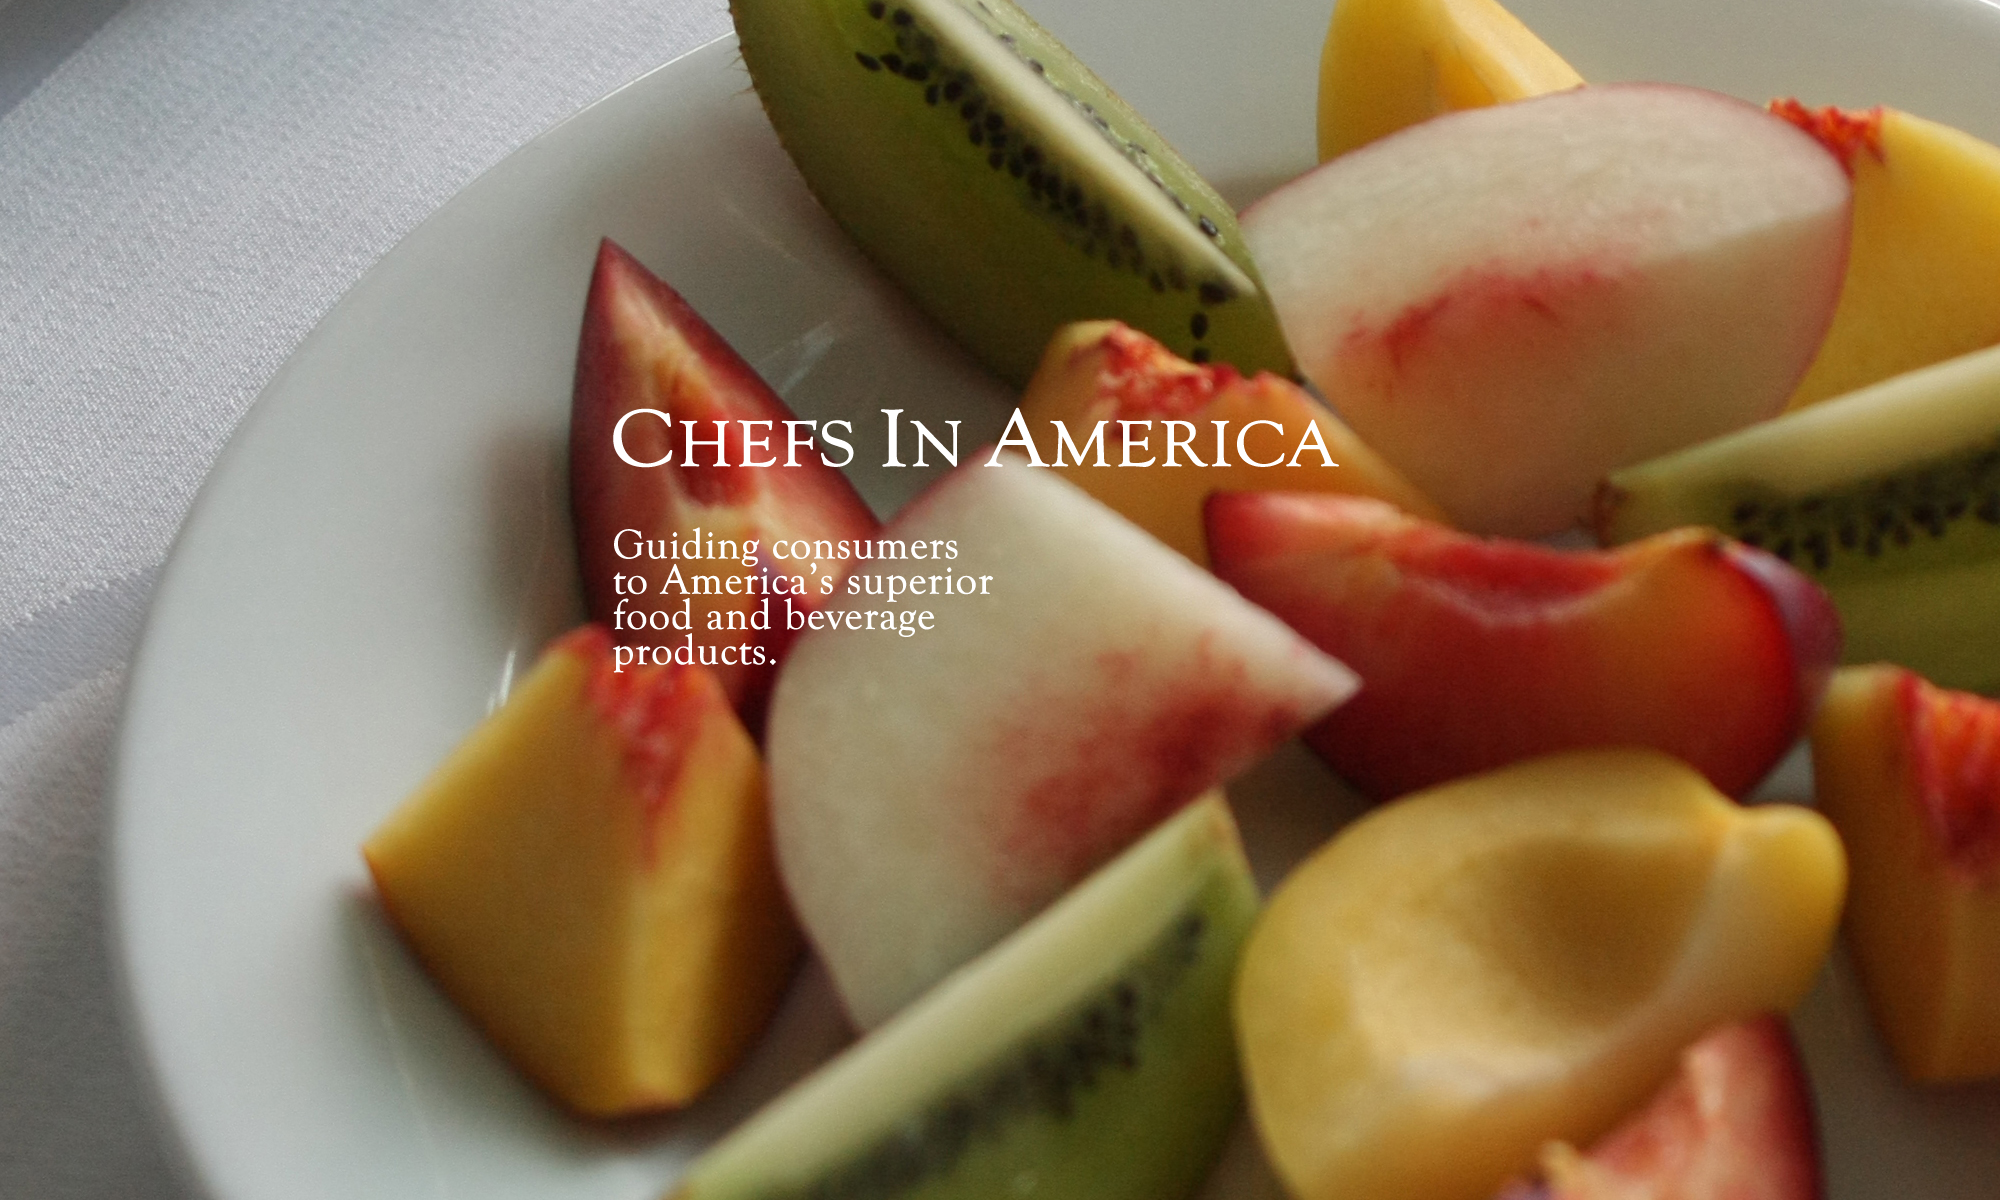 Asian celebrity chefs